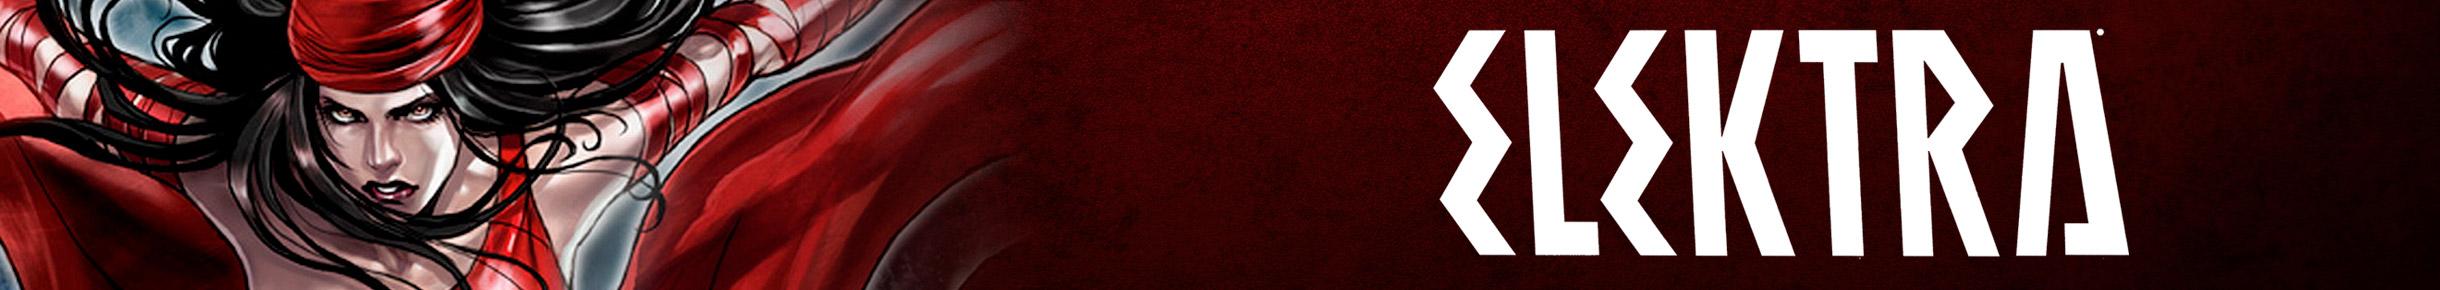 Elektra Merchandise Banner